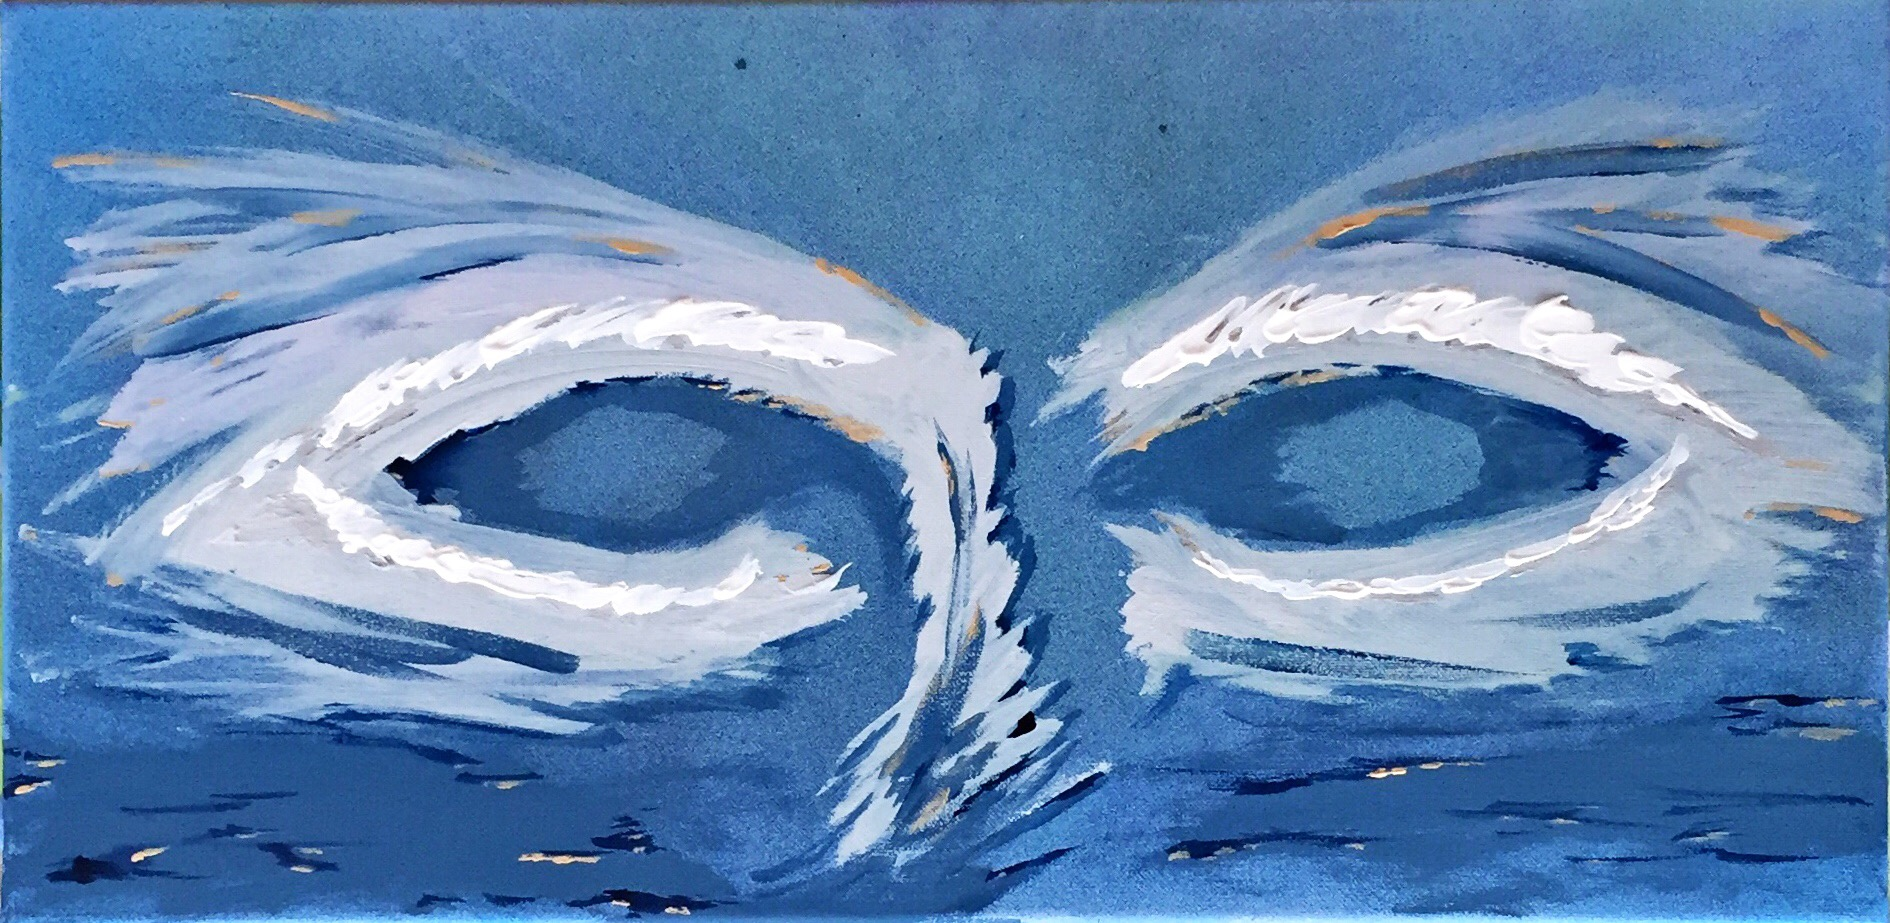 Bild Acrylmalerei auf Leinwand Seele Michael Lubomirski